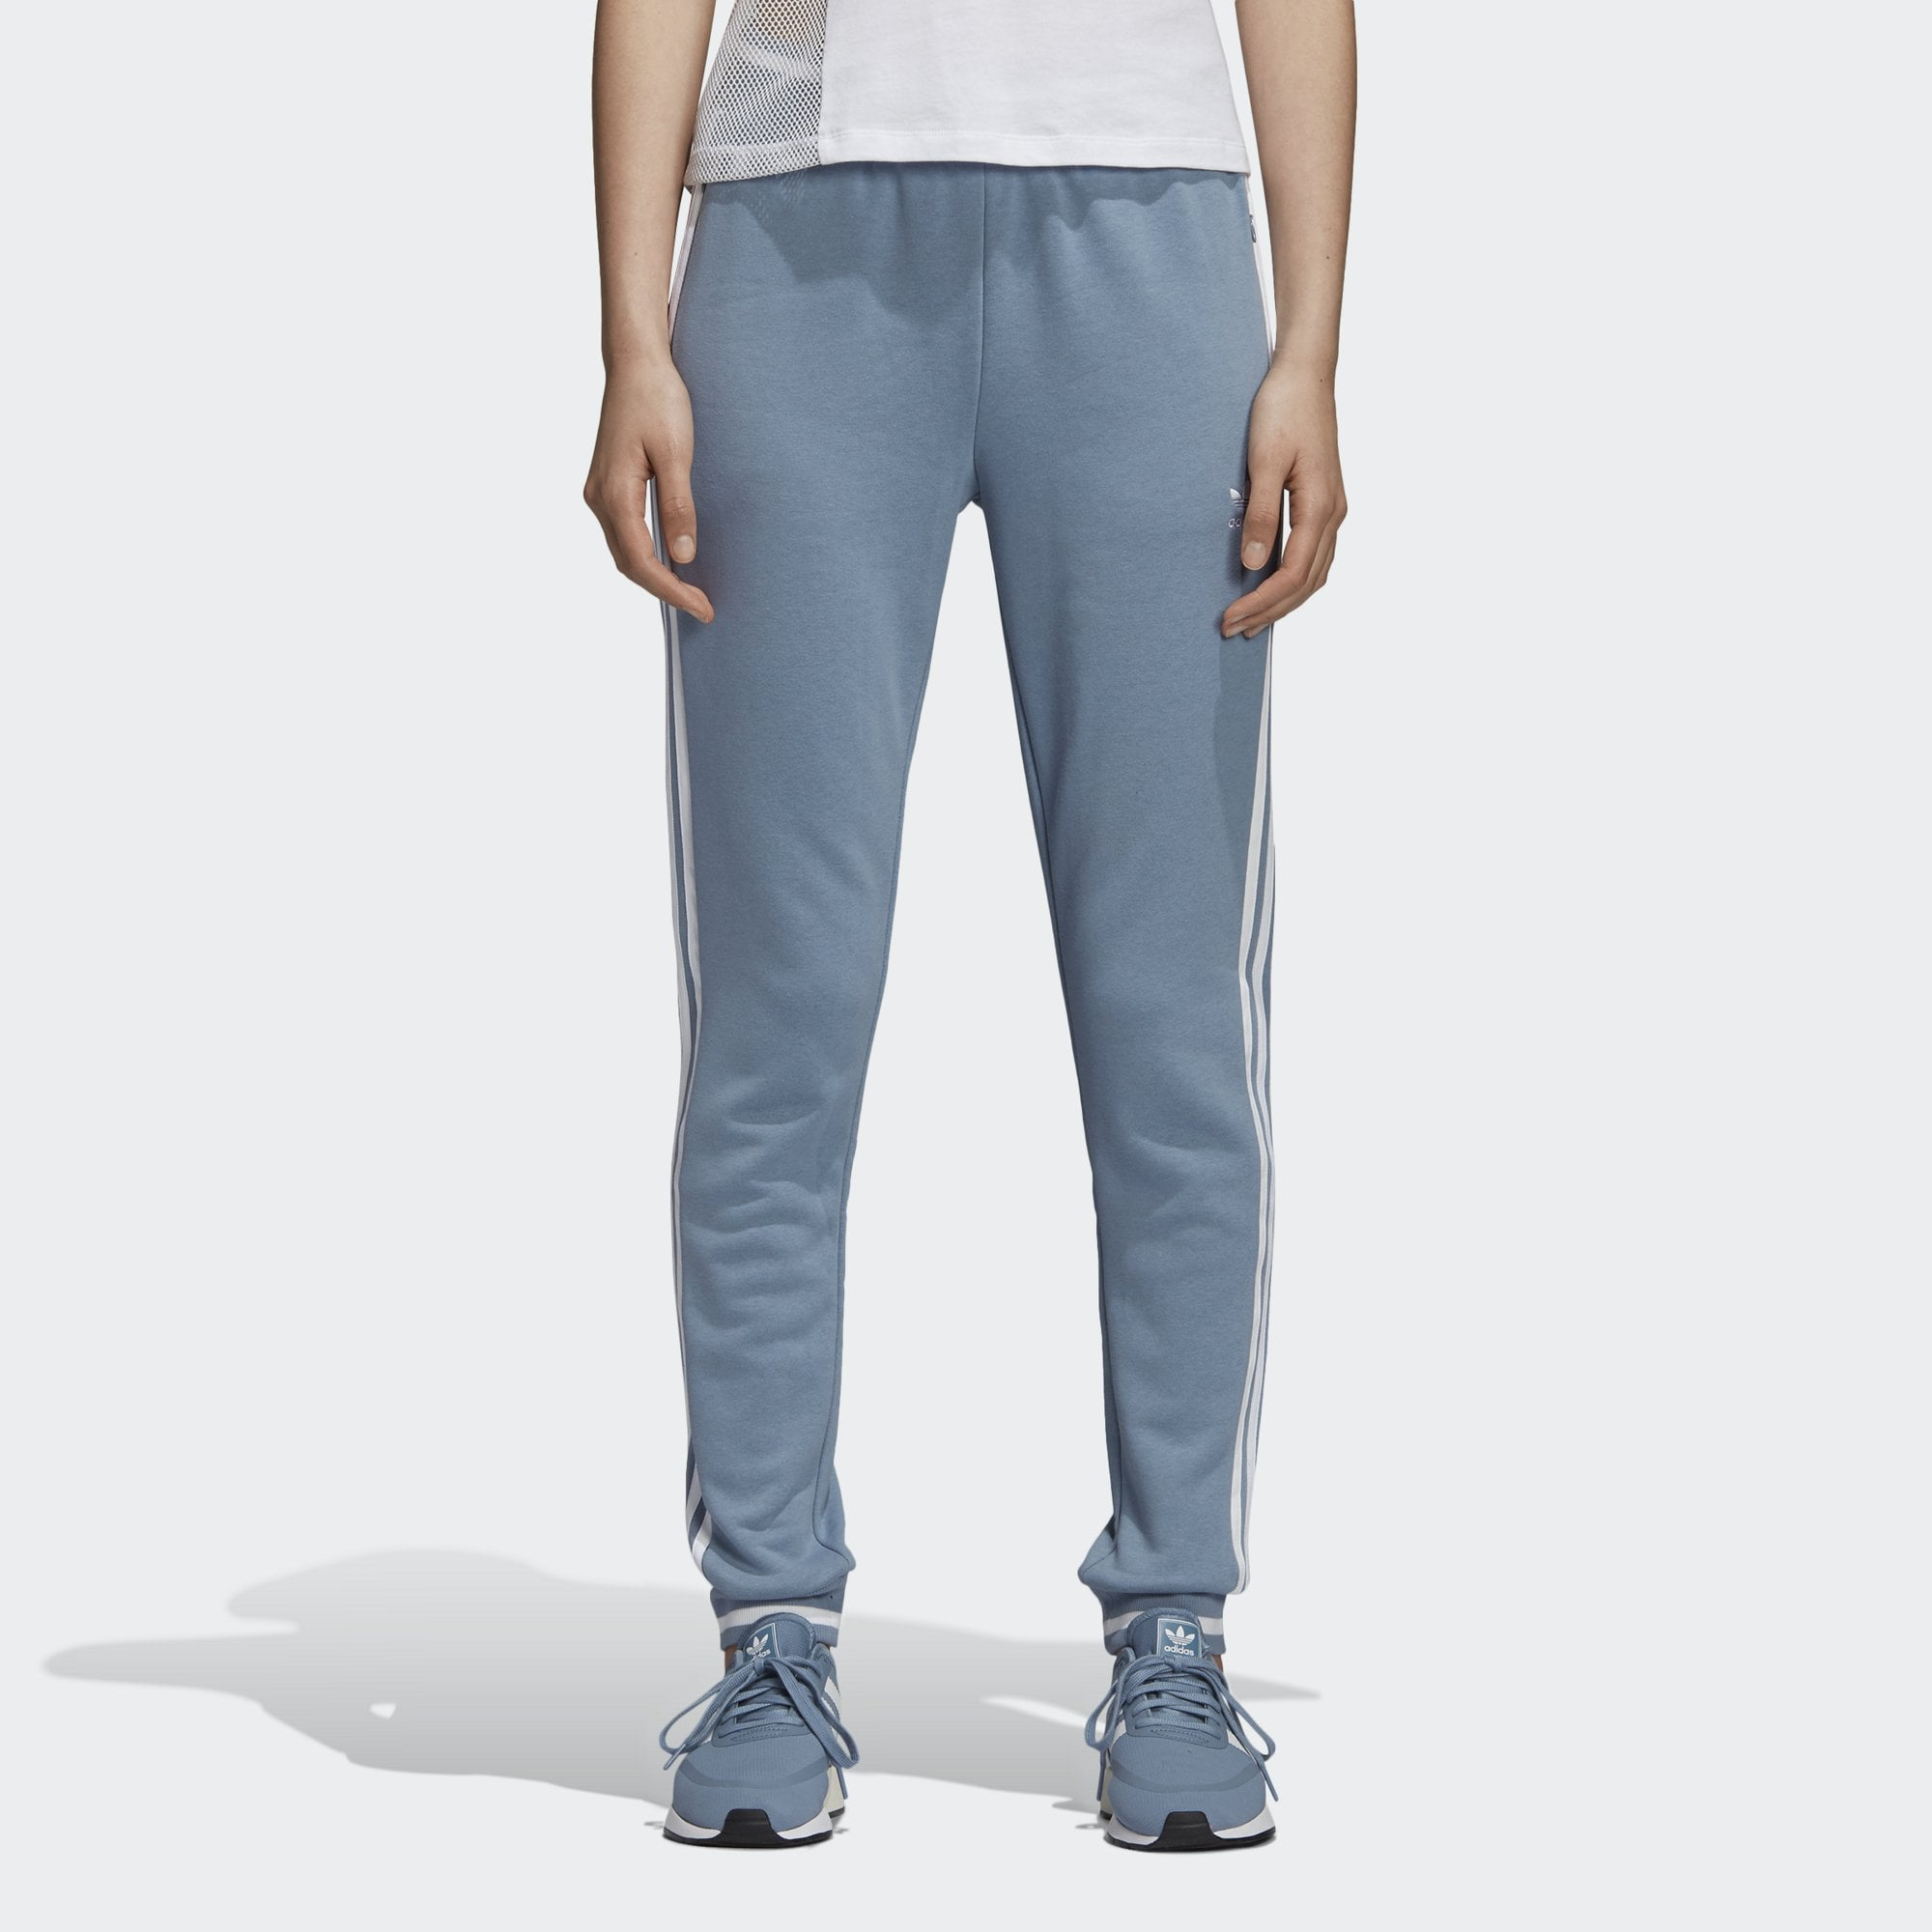 Adidas Originals Women's Active Icons Track Pants - Womens Clothing from  Cooshti.com